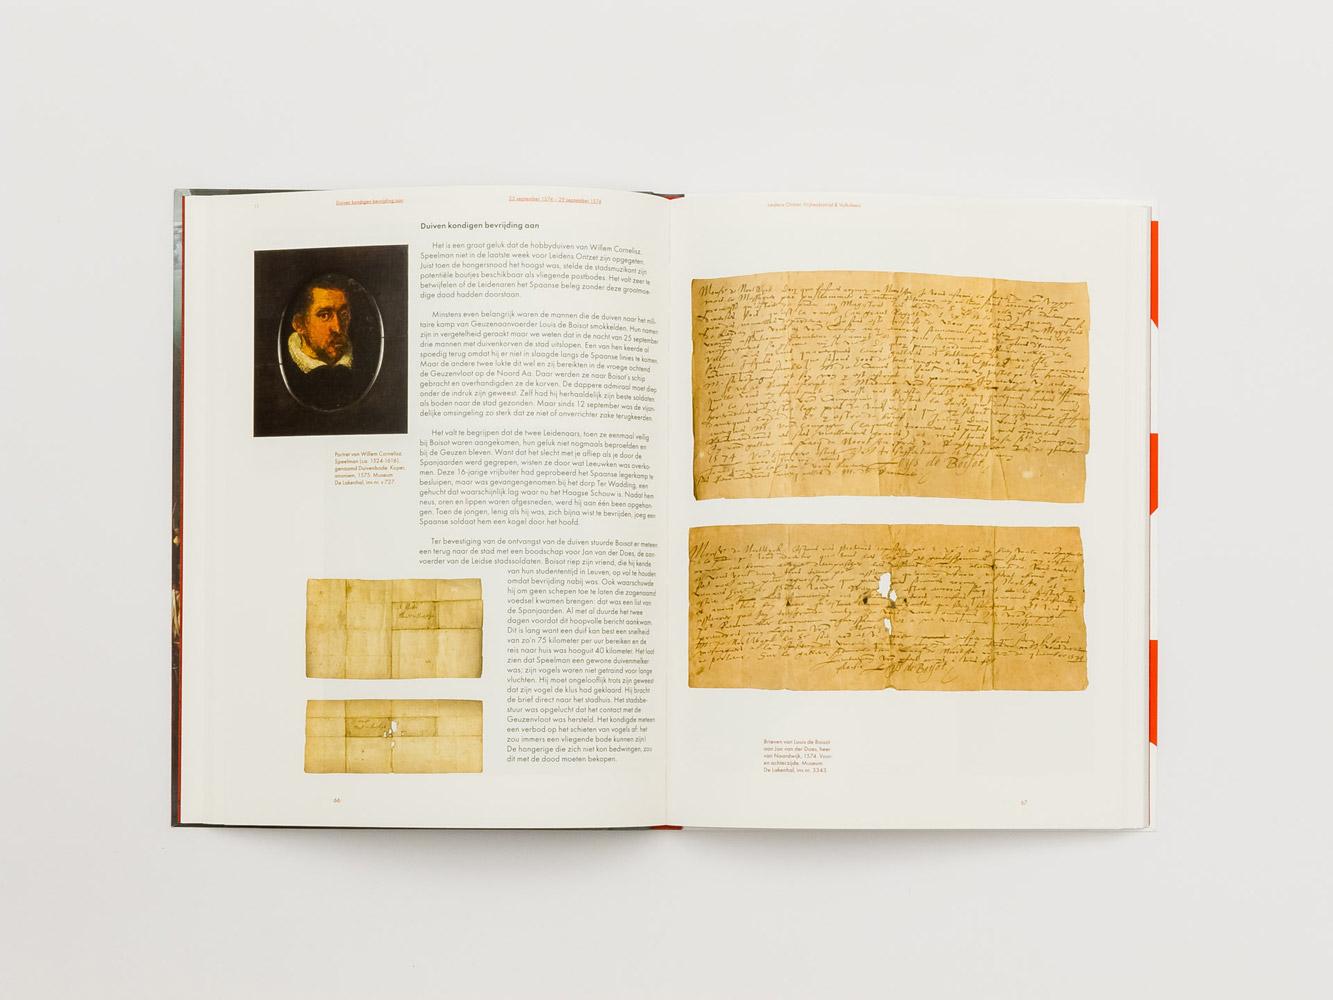 museum de lakenhal leidens ontzet publicatie nr 8 jpg